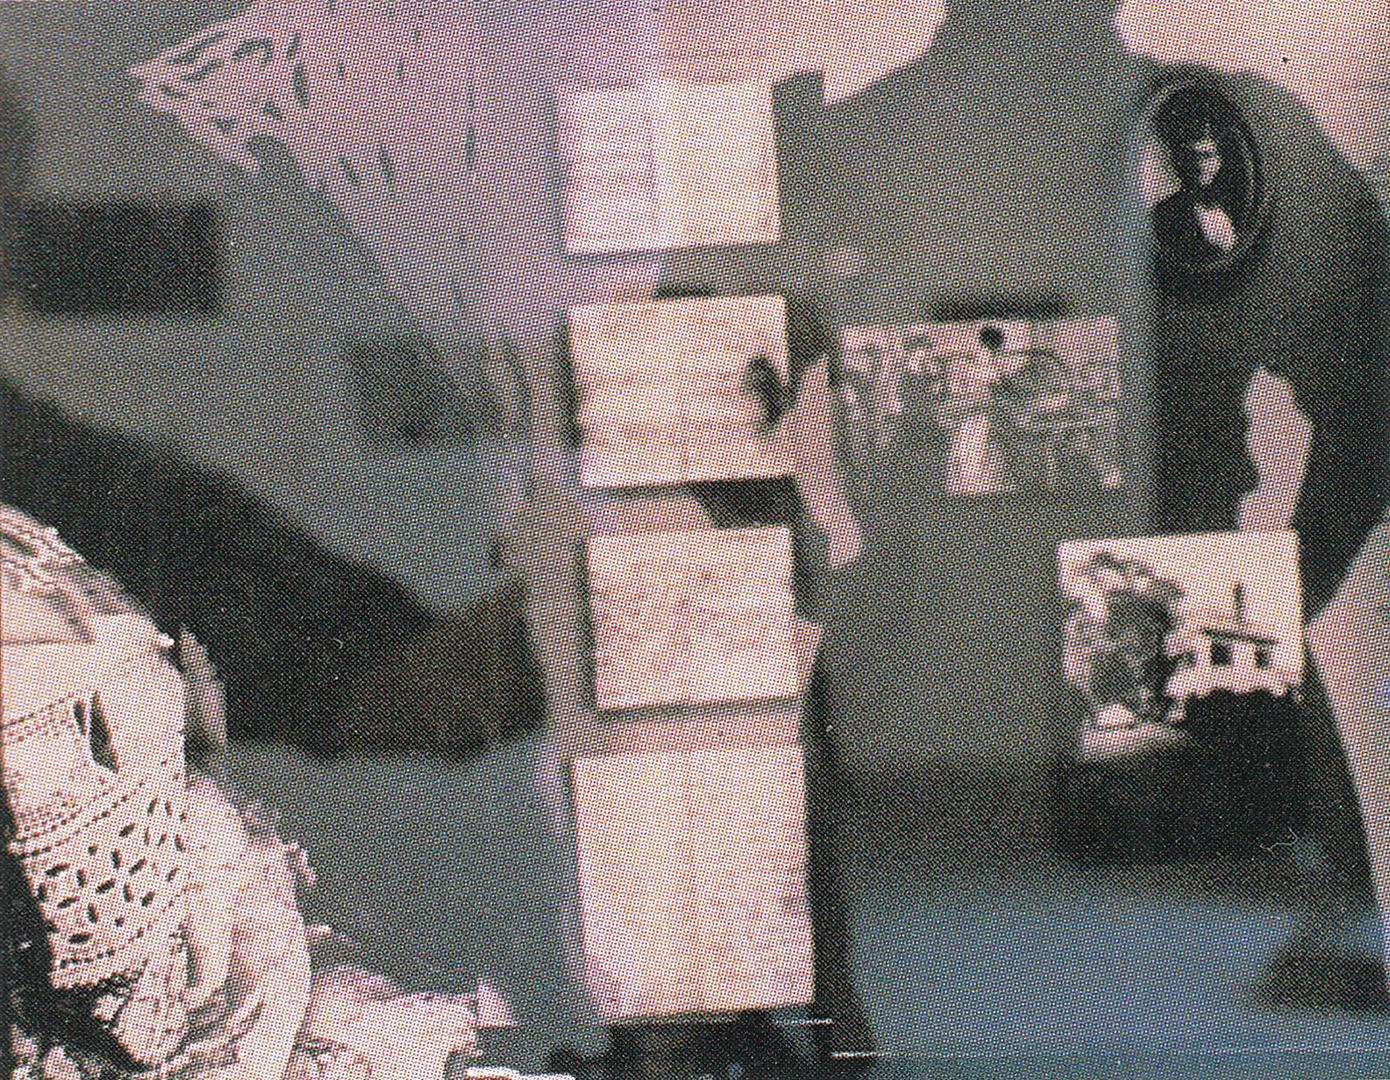 ©1991, Rosemary Smith, History Looking at Herself